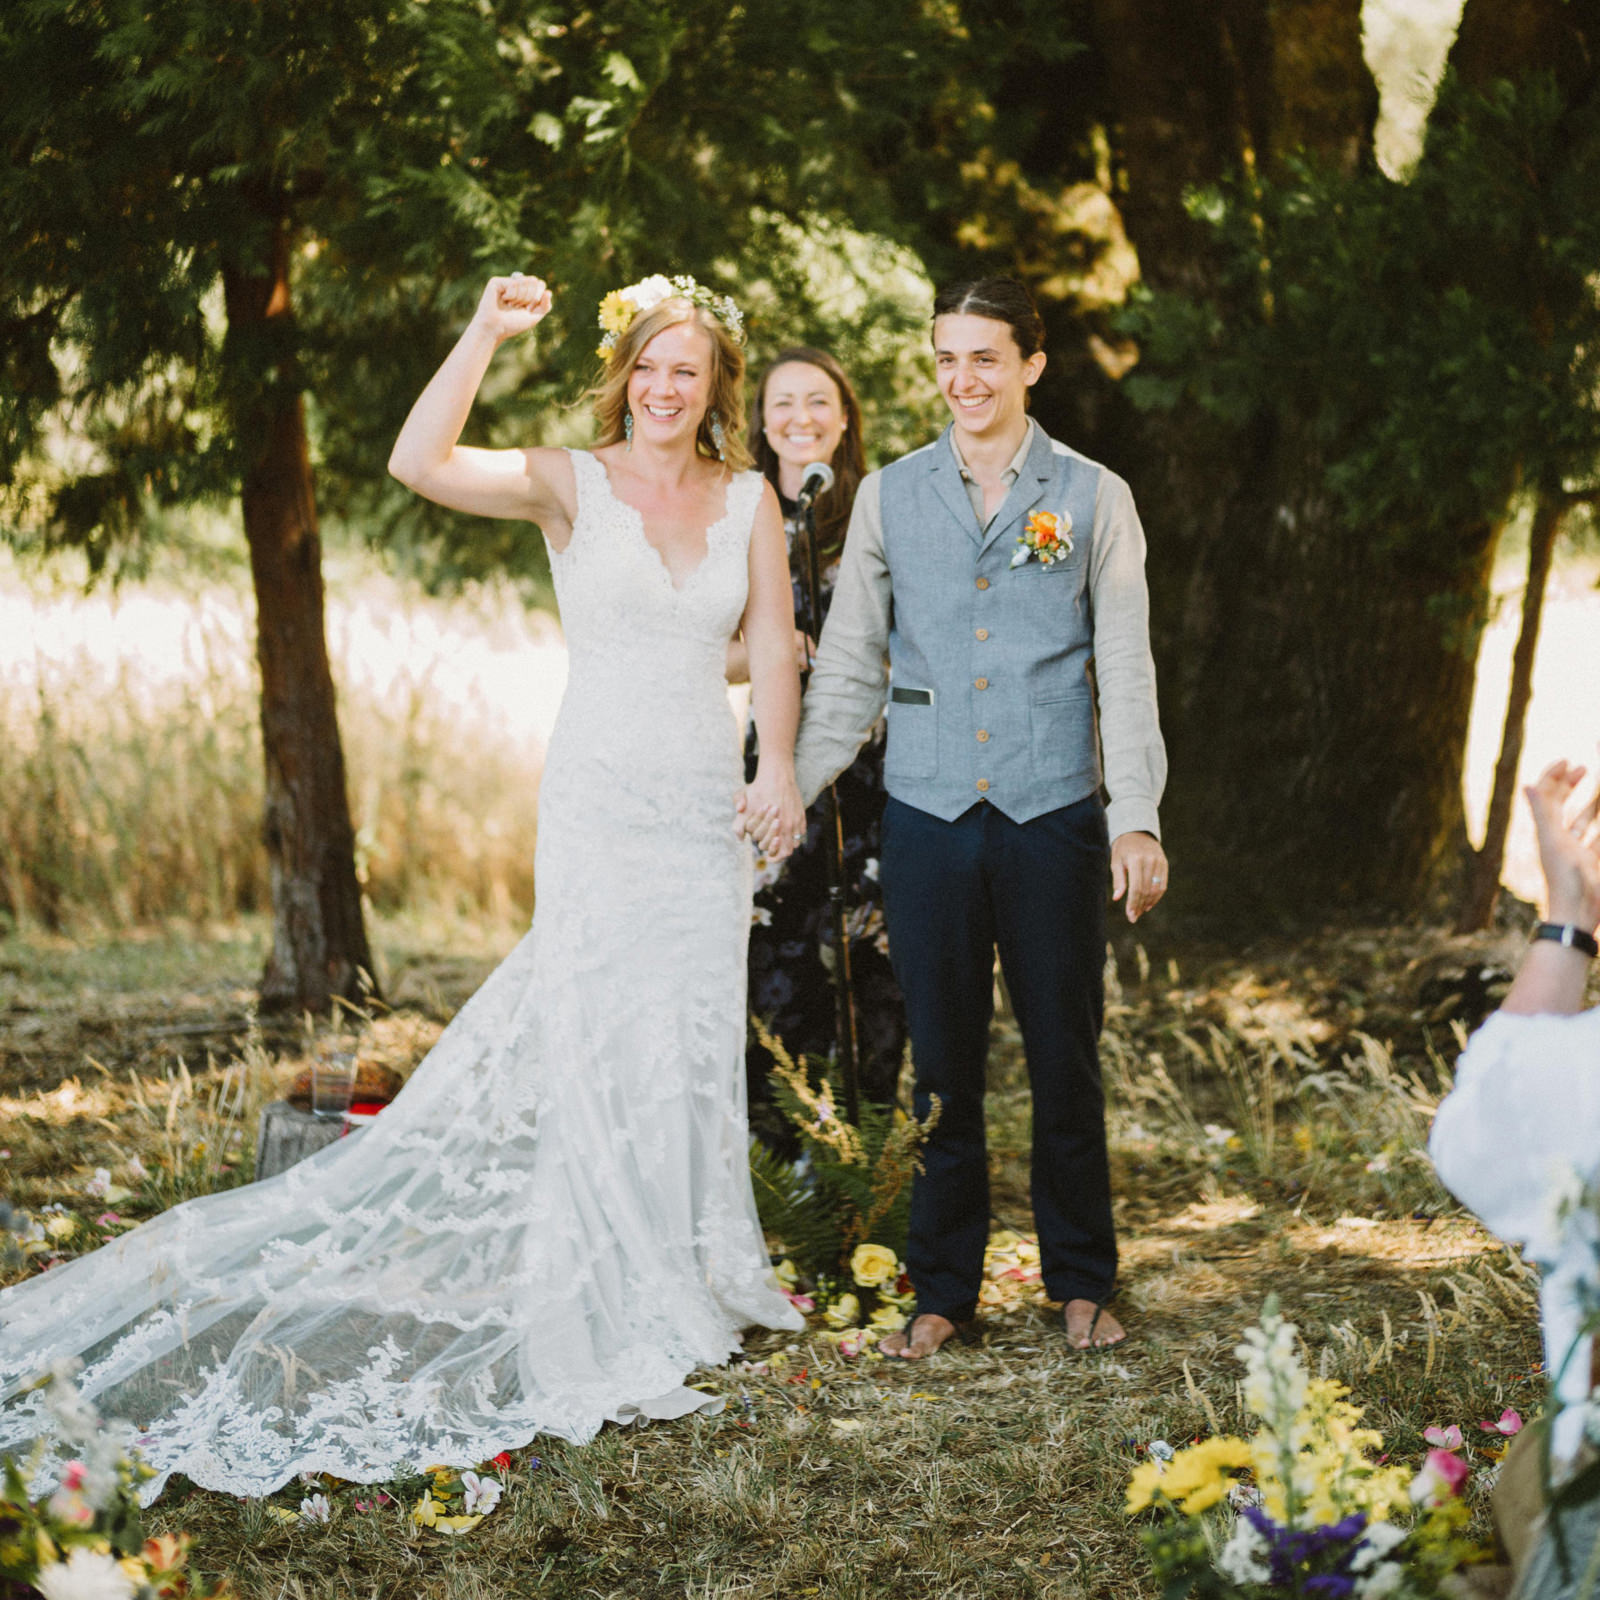 rivers-bend-retreat-wedding-036 RIVER'S BEND RETREAT WEDDING